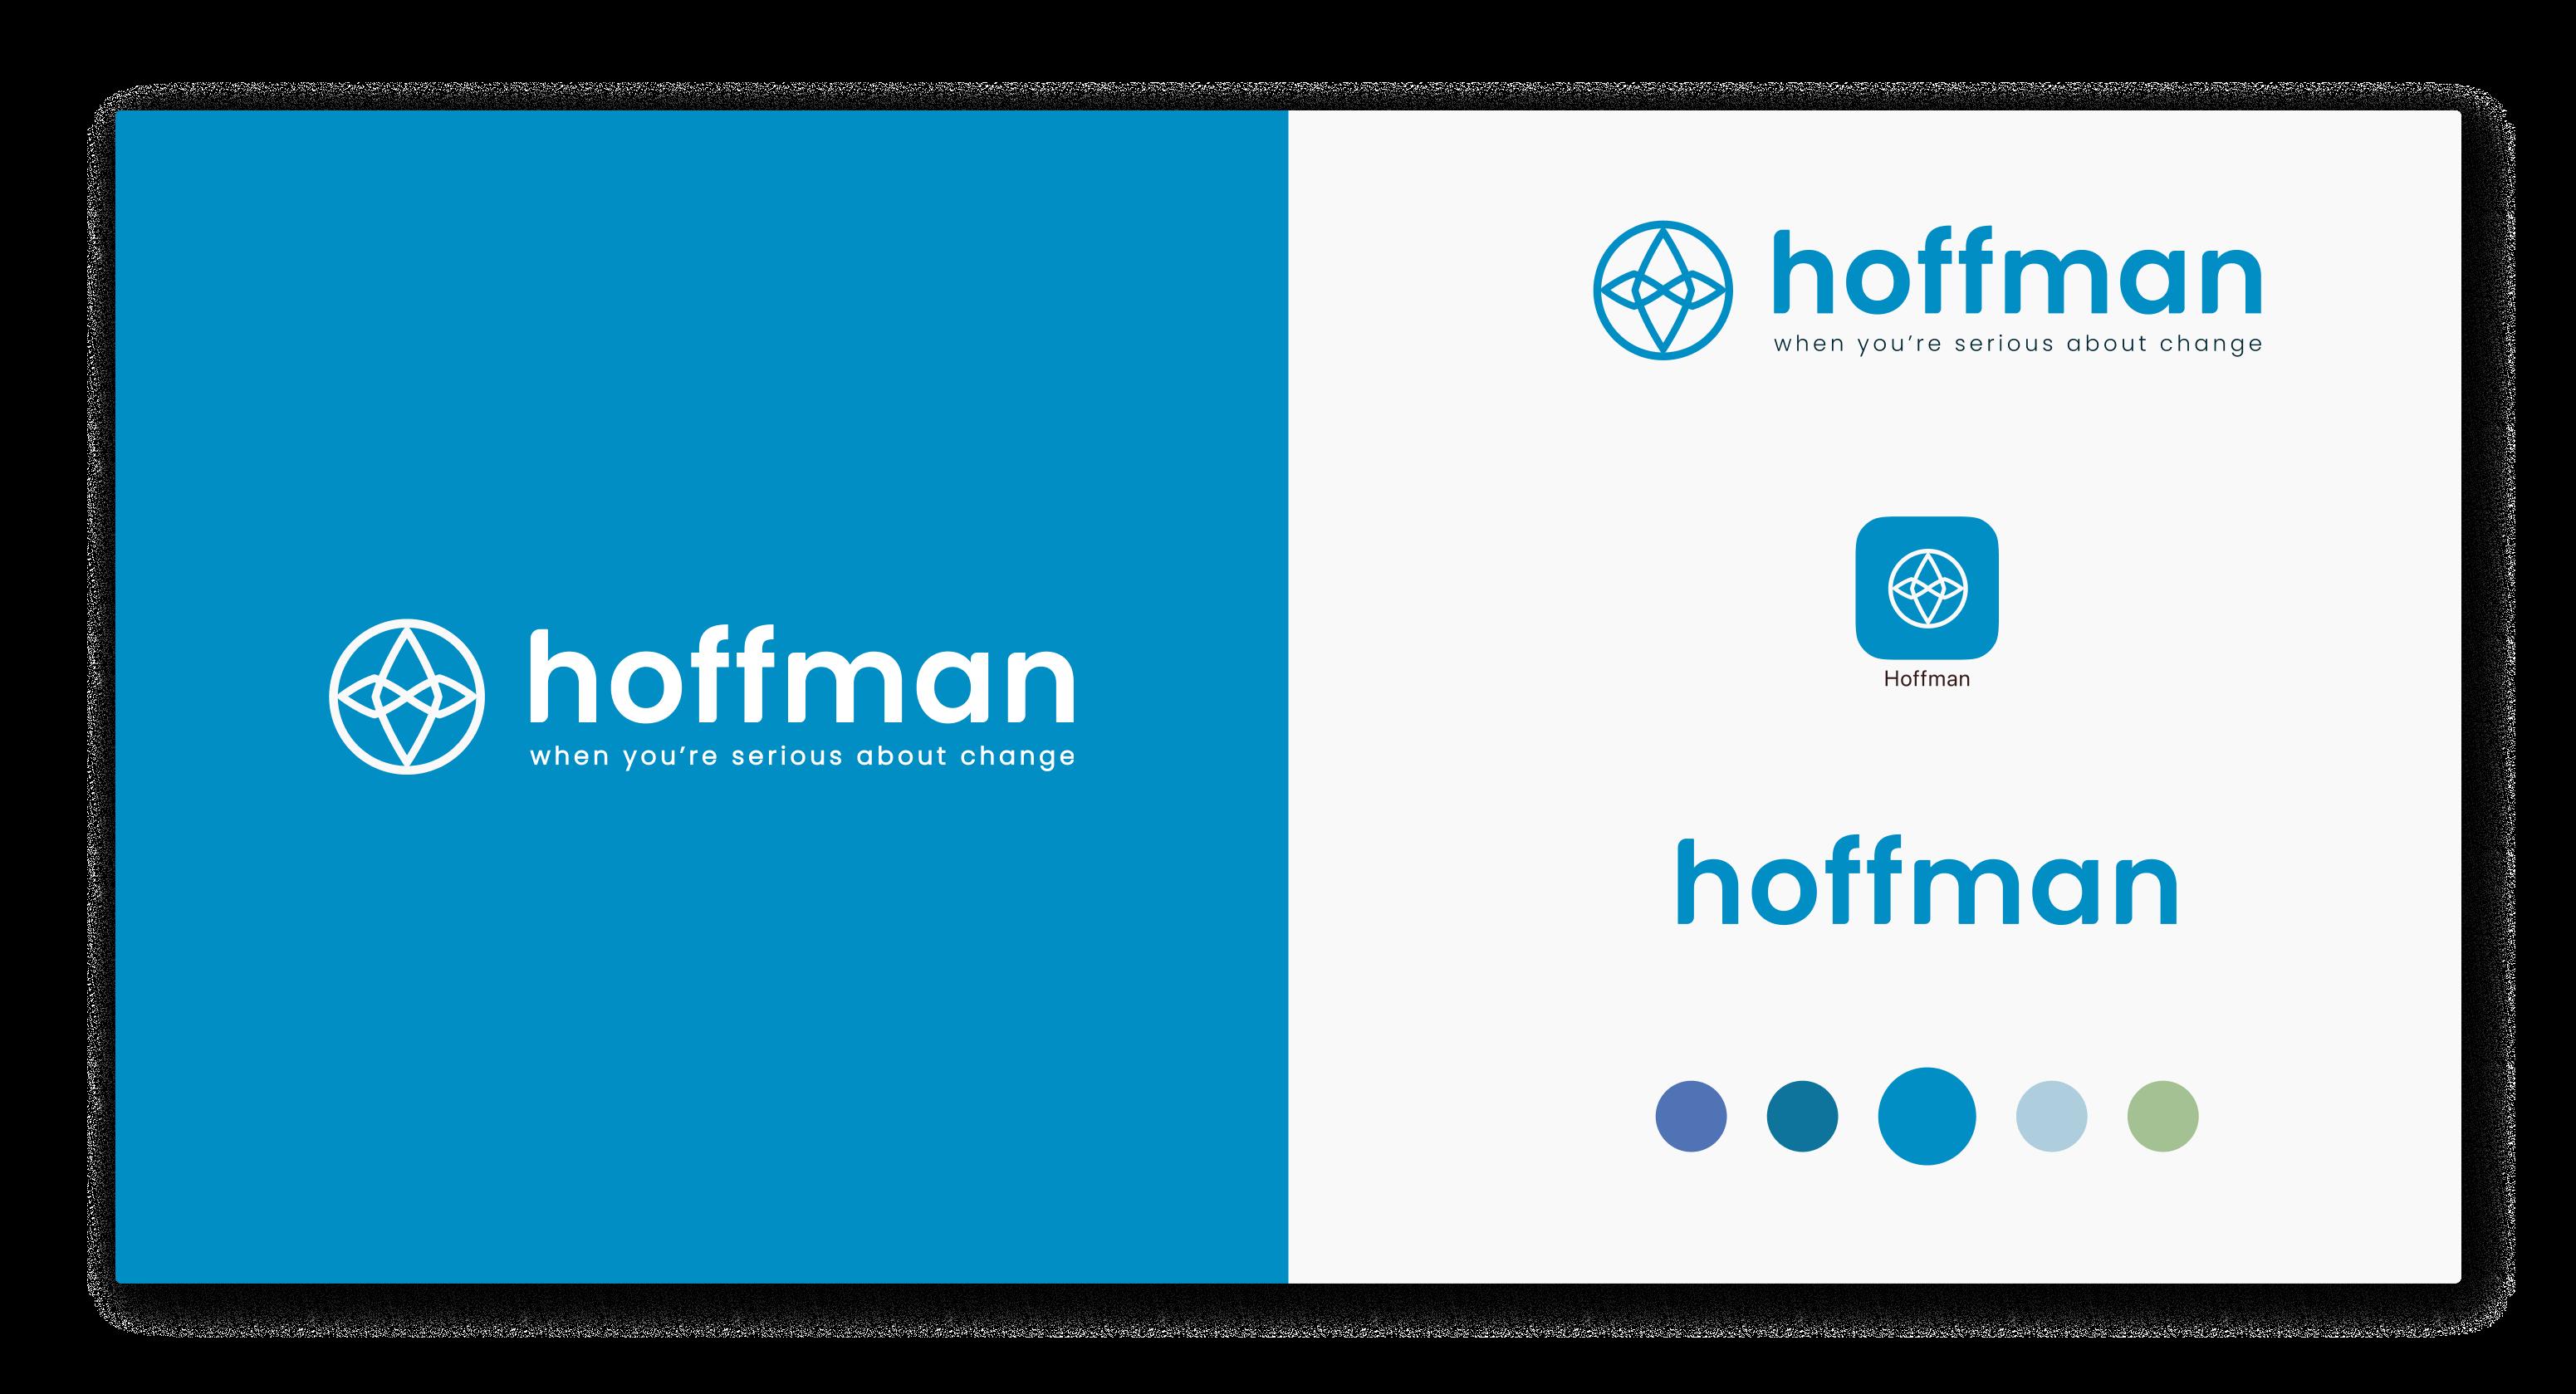 hoffman-logo.png